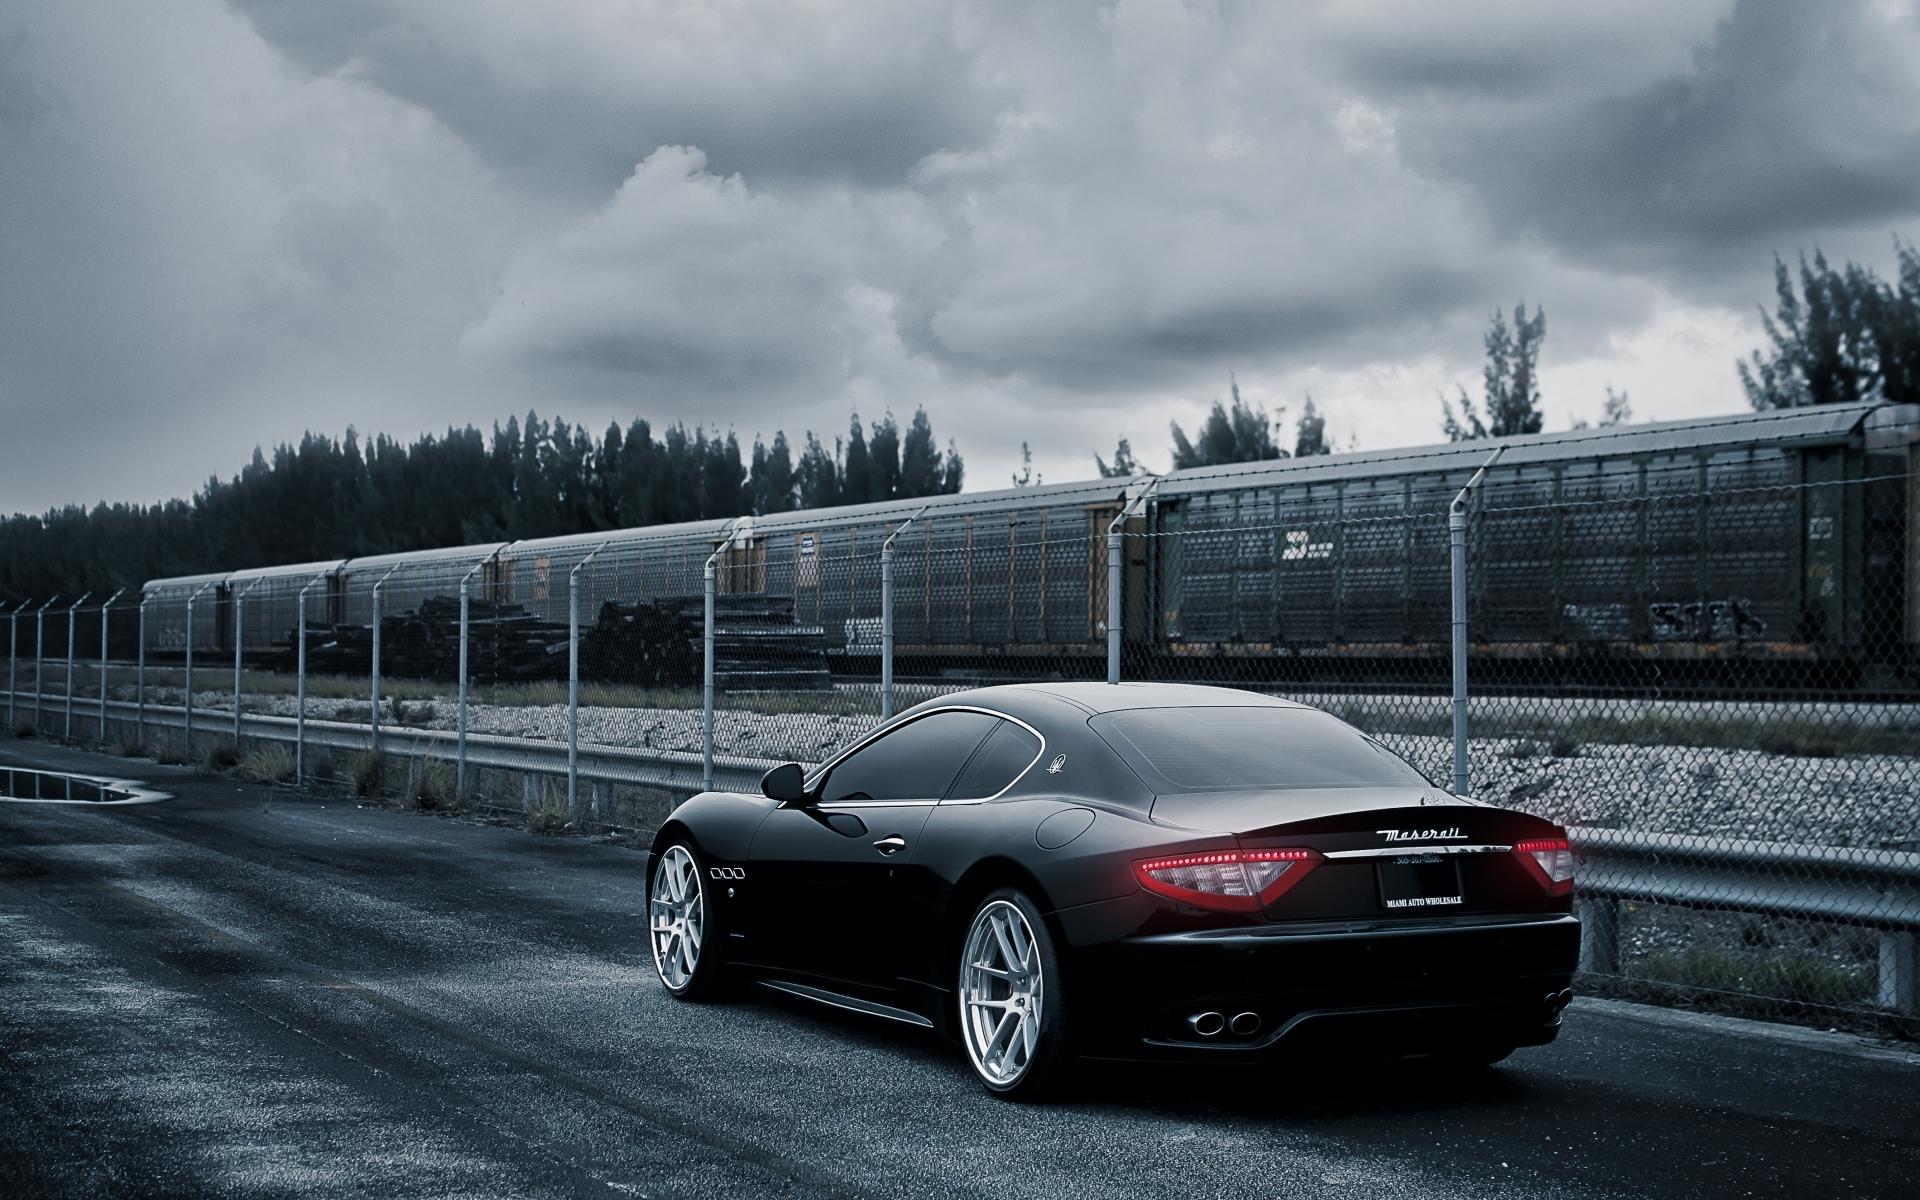 Maserati; Maserati; Maserati Images ...